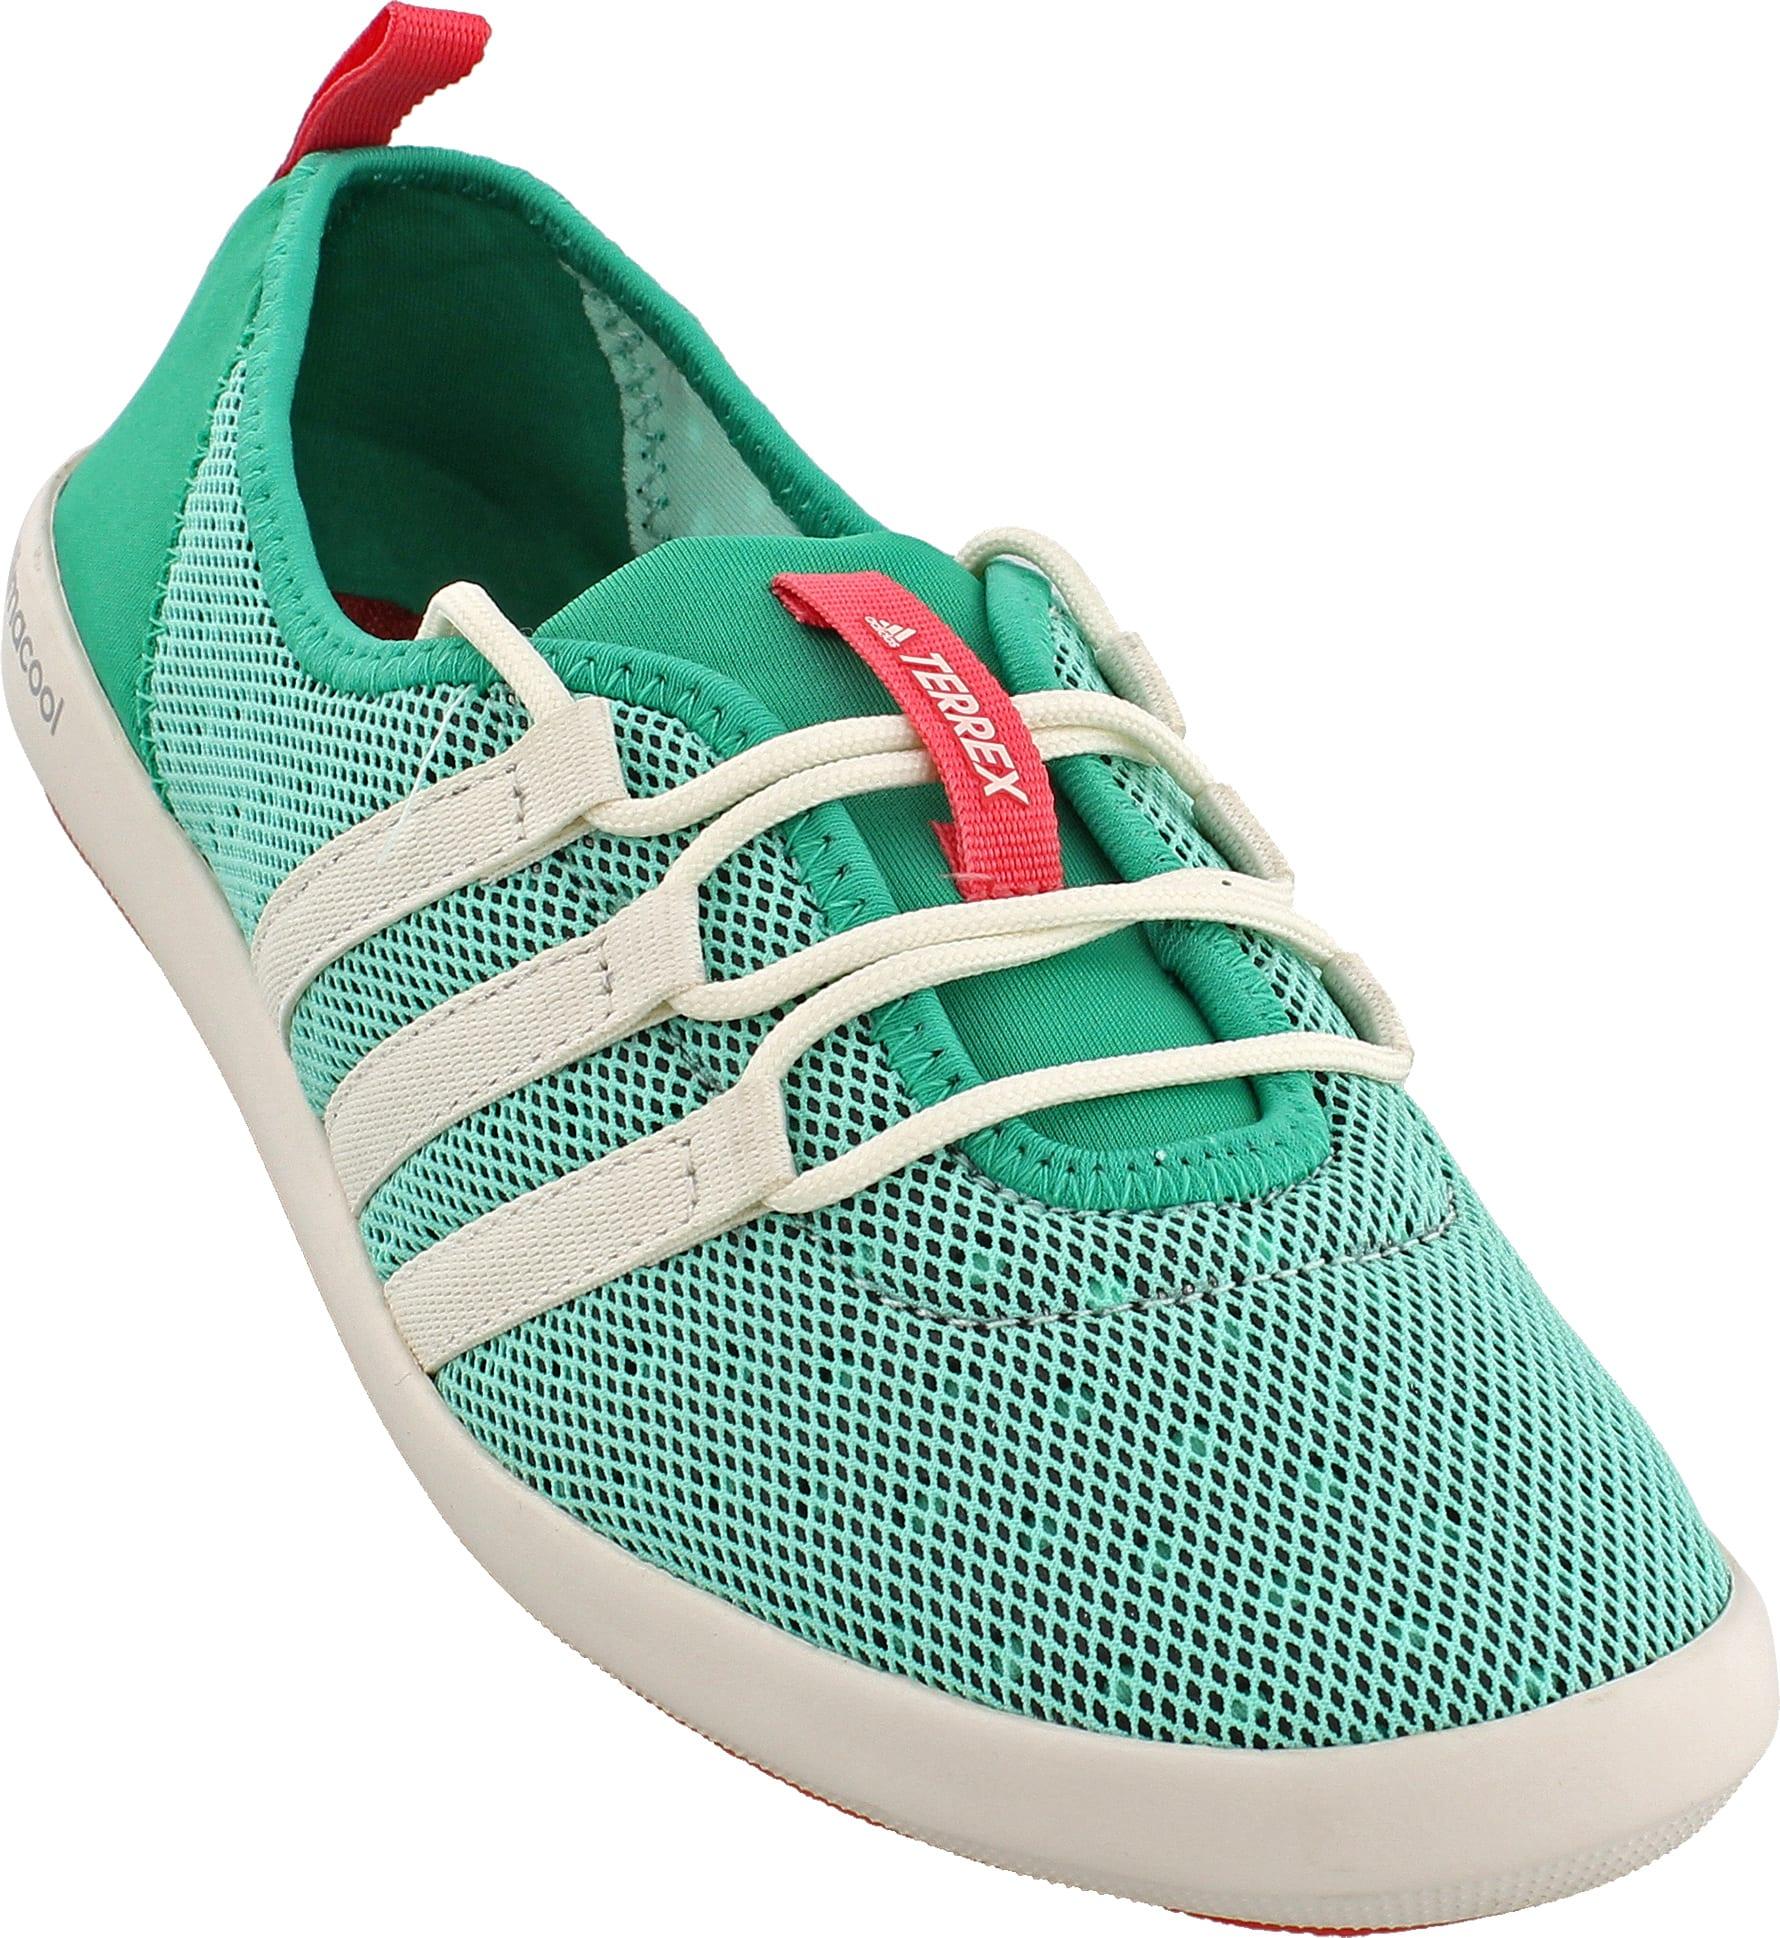 newest c7cf3 bec3b Adidas Terrex Climacool Boat Sleek Water Shoes - thumbnail 2